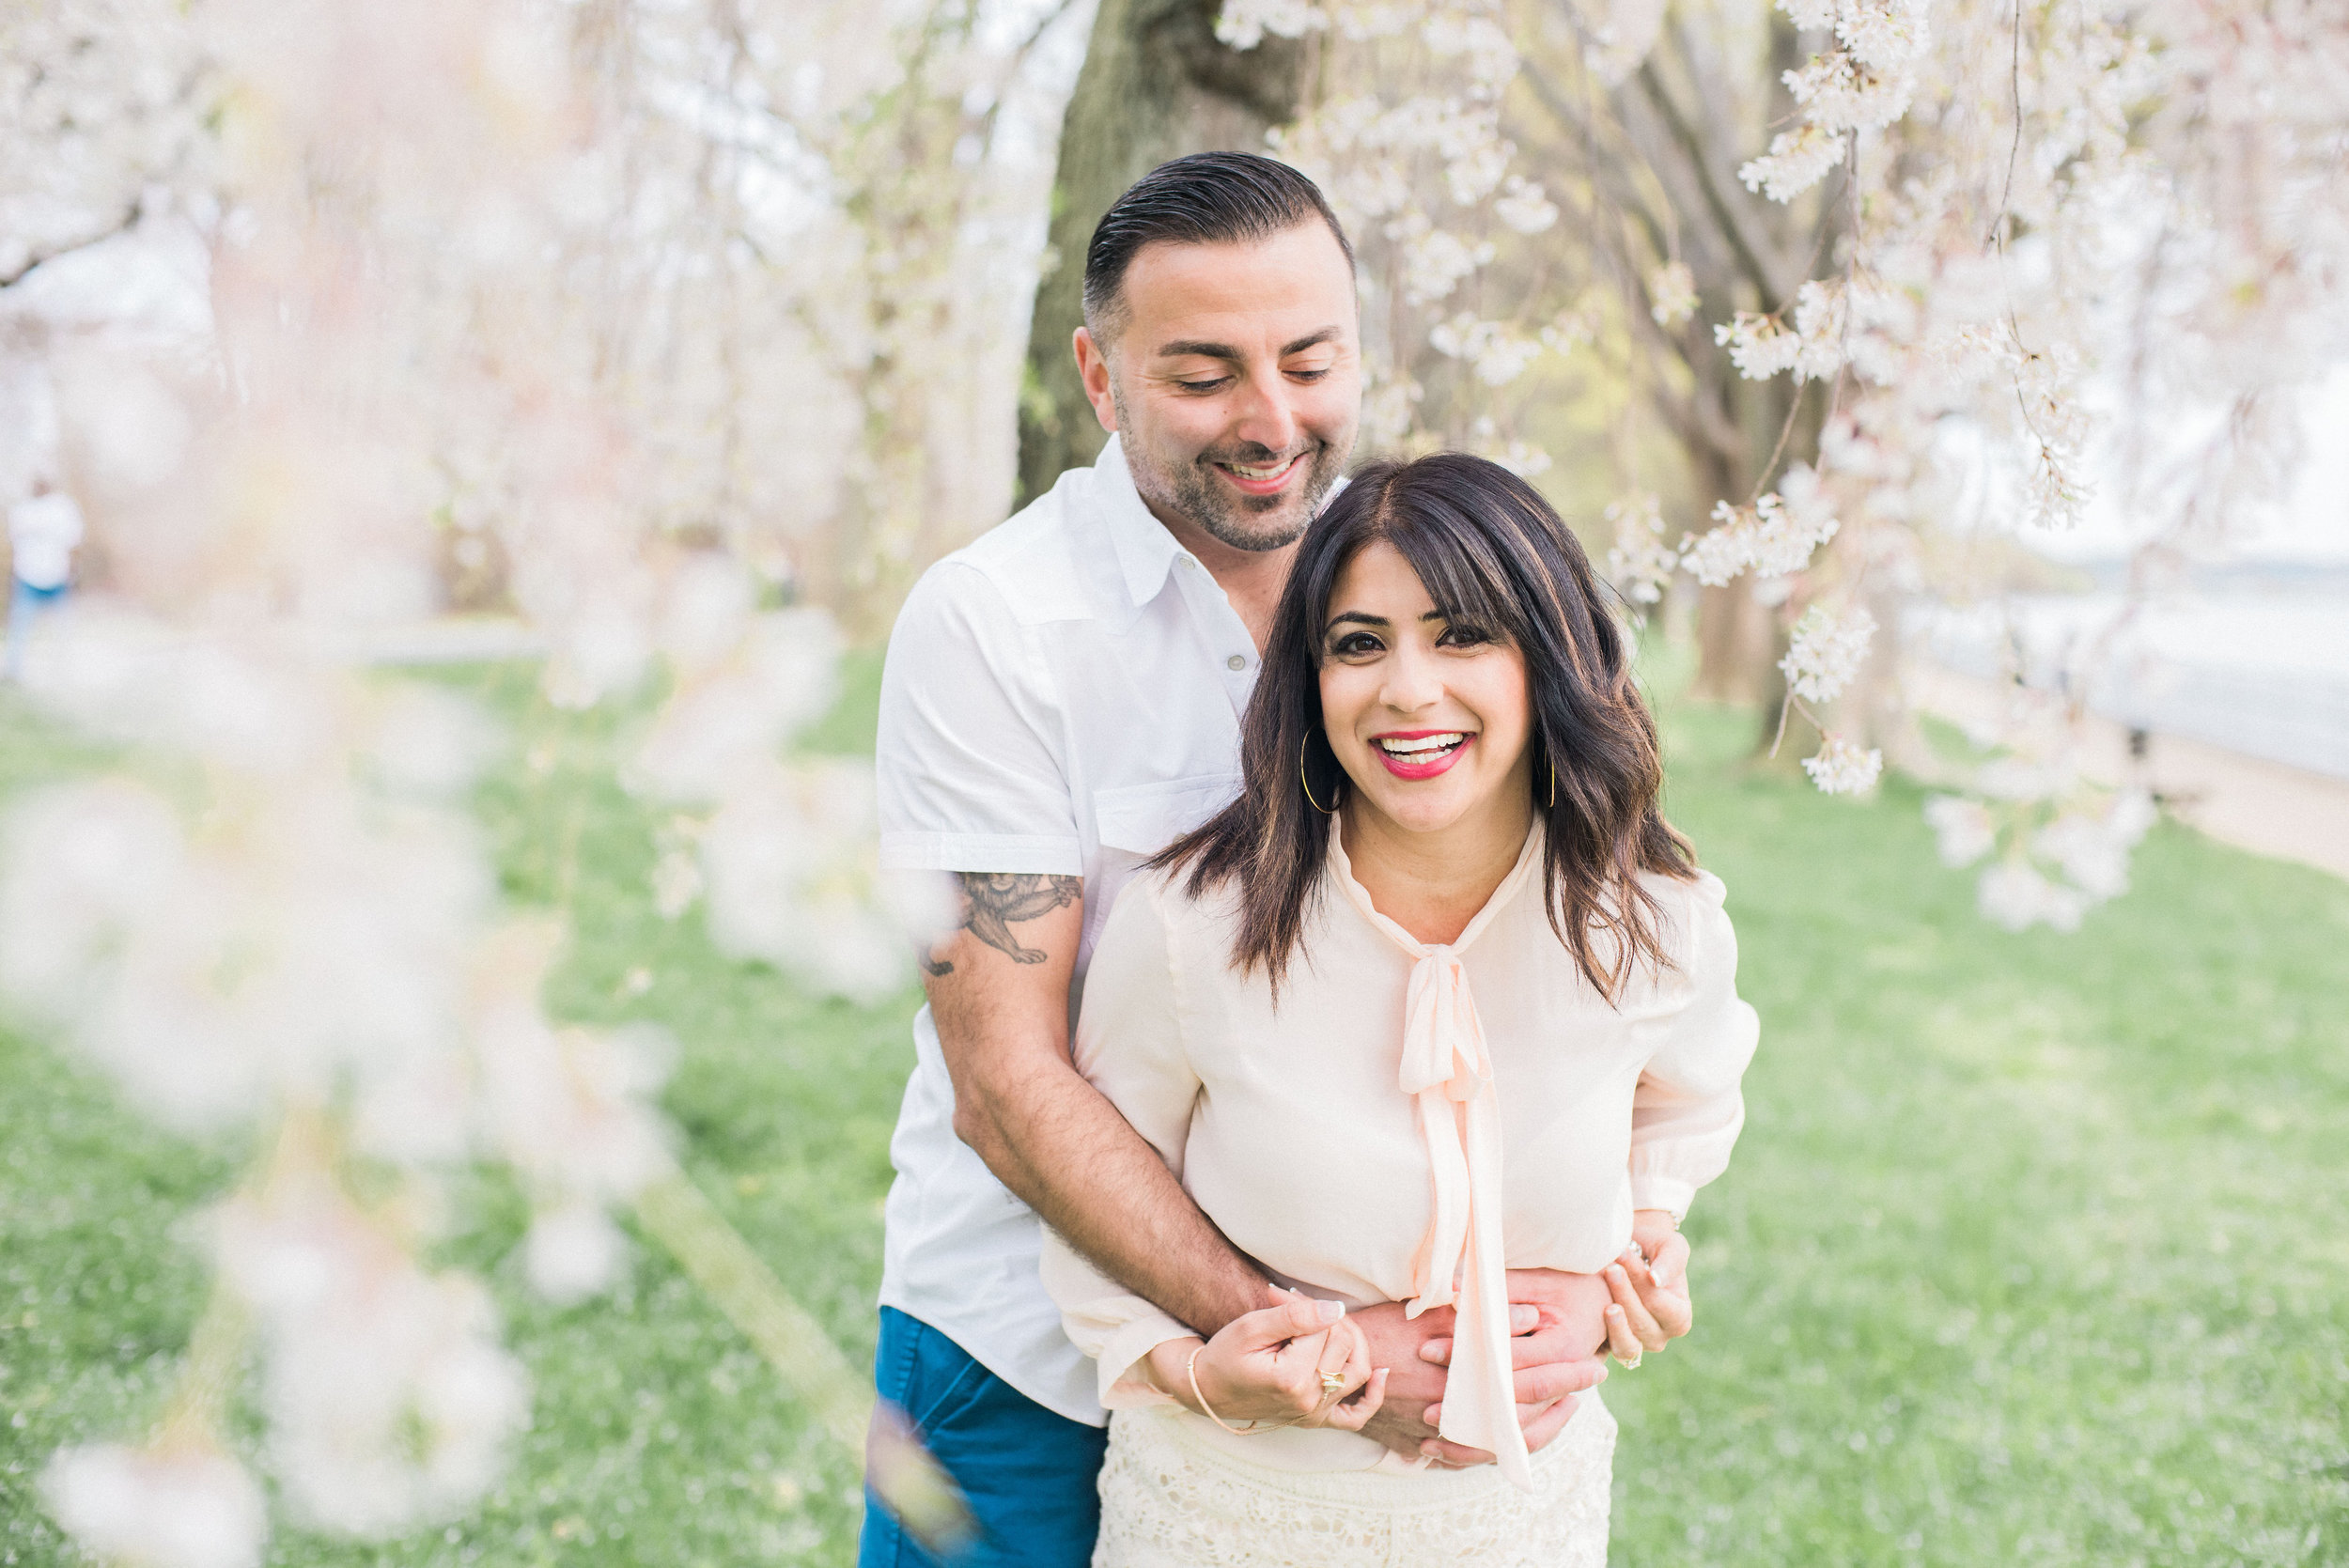 washington dc cherry blossom engagement session fine art wedding photographer lissa ryan photography